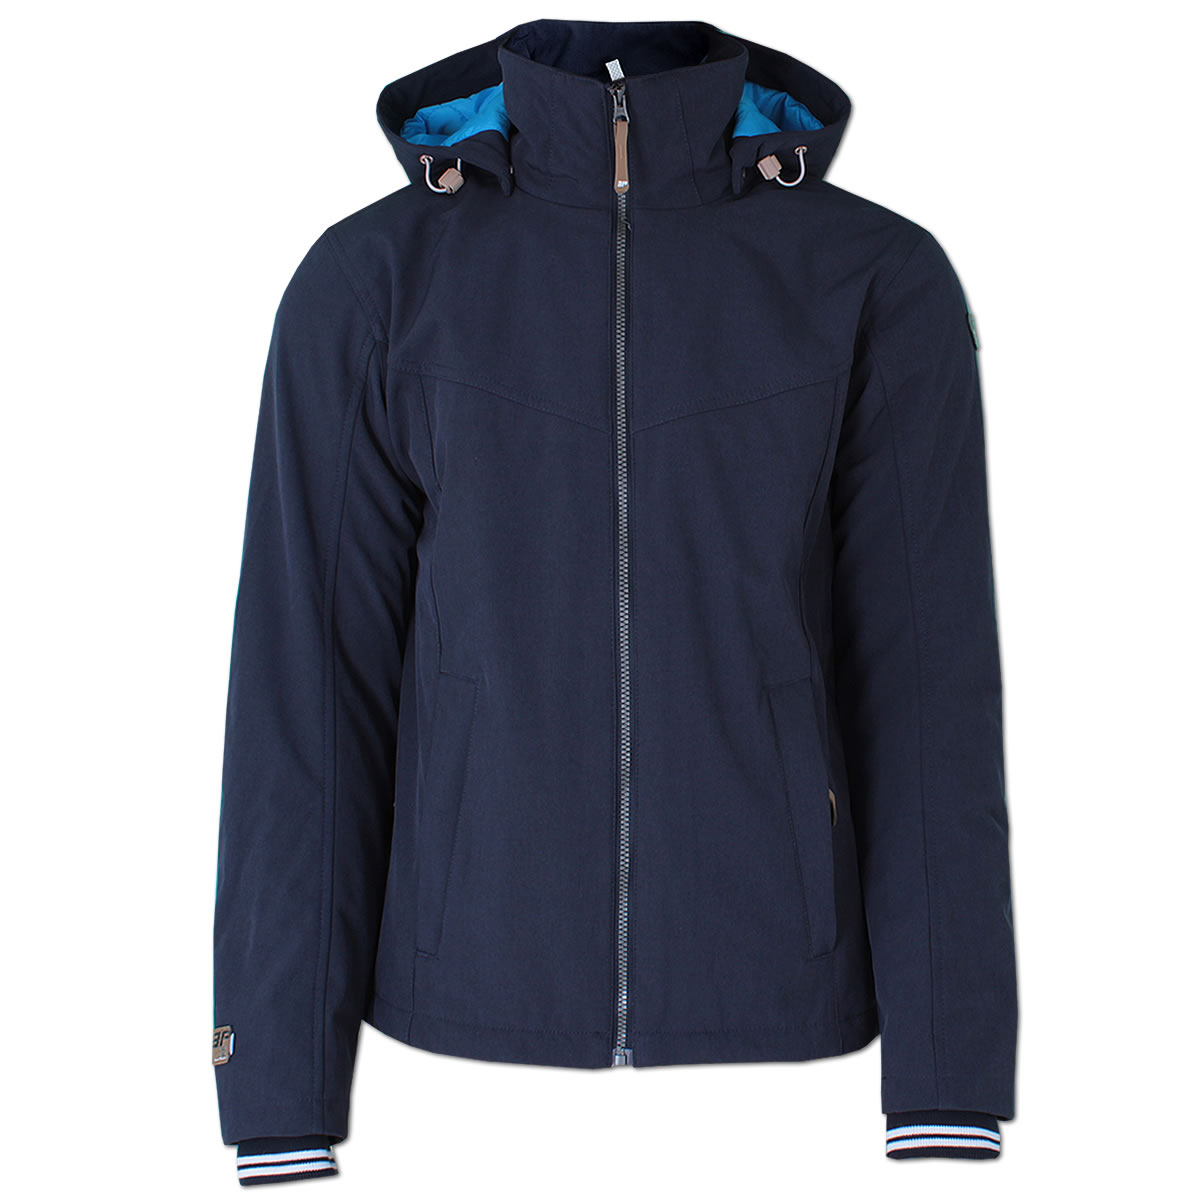 Details zu adidas Herren Terrex Promo Gore Tex Jacke Pro Shell Outdoor GTX Jacket rot